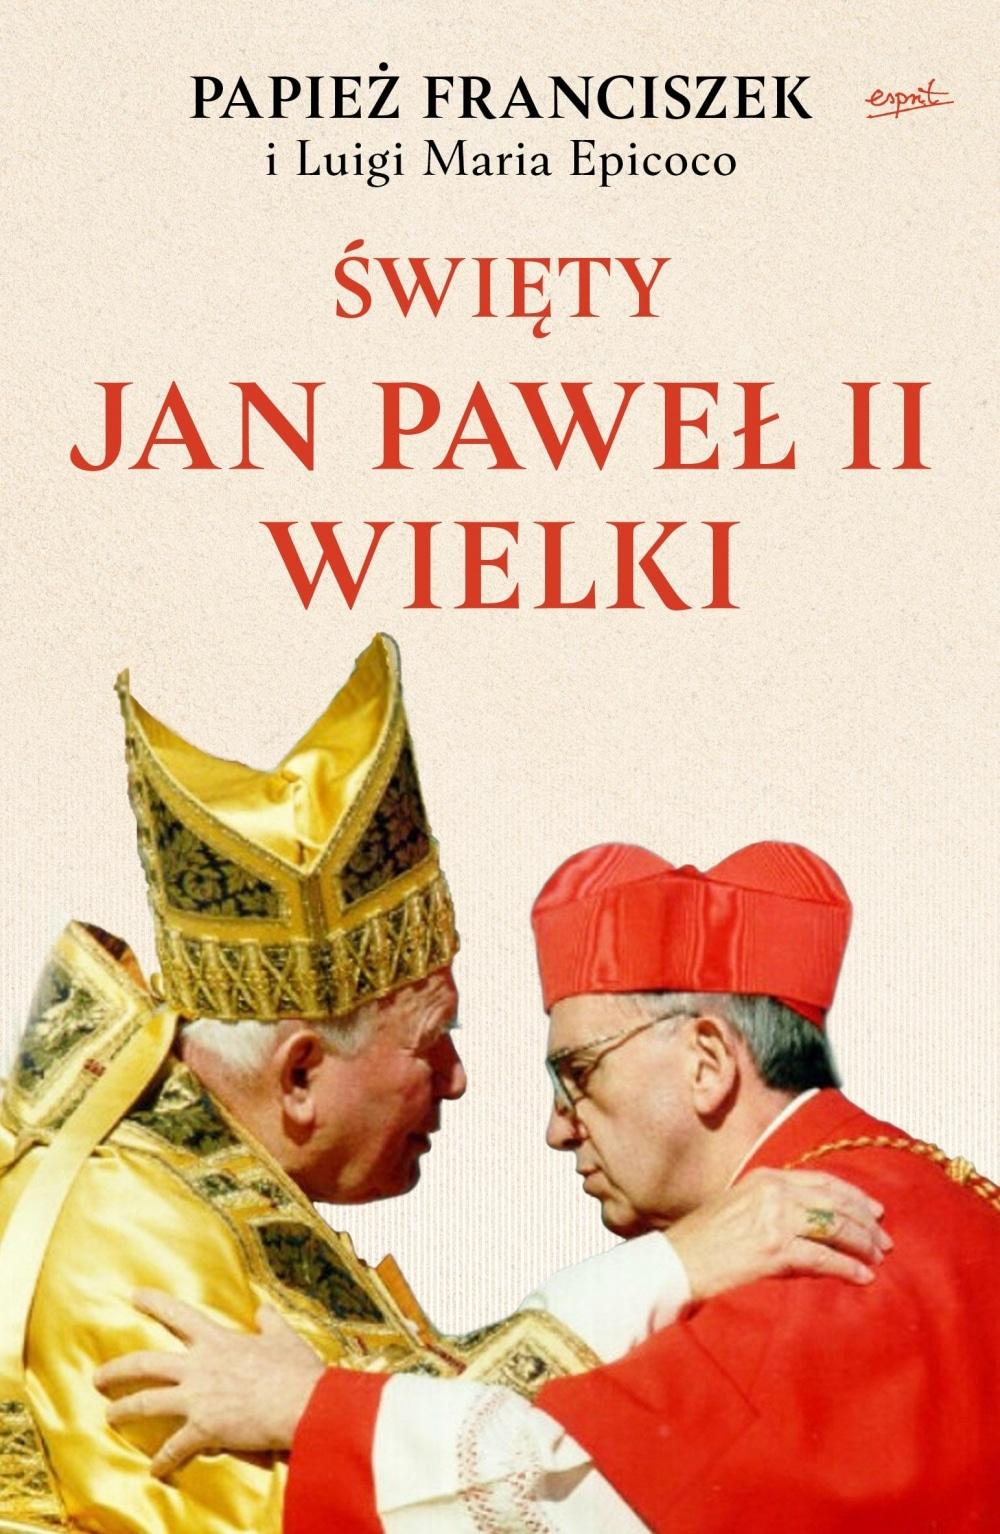 swiety-jan-pawe-ii-wielki